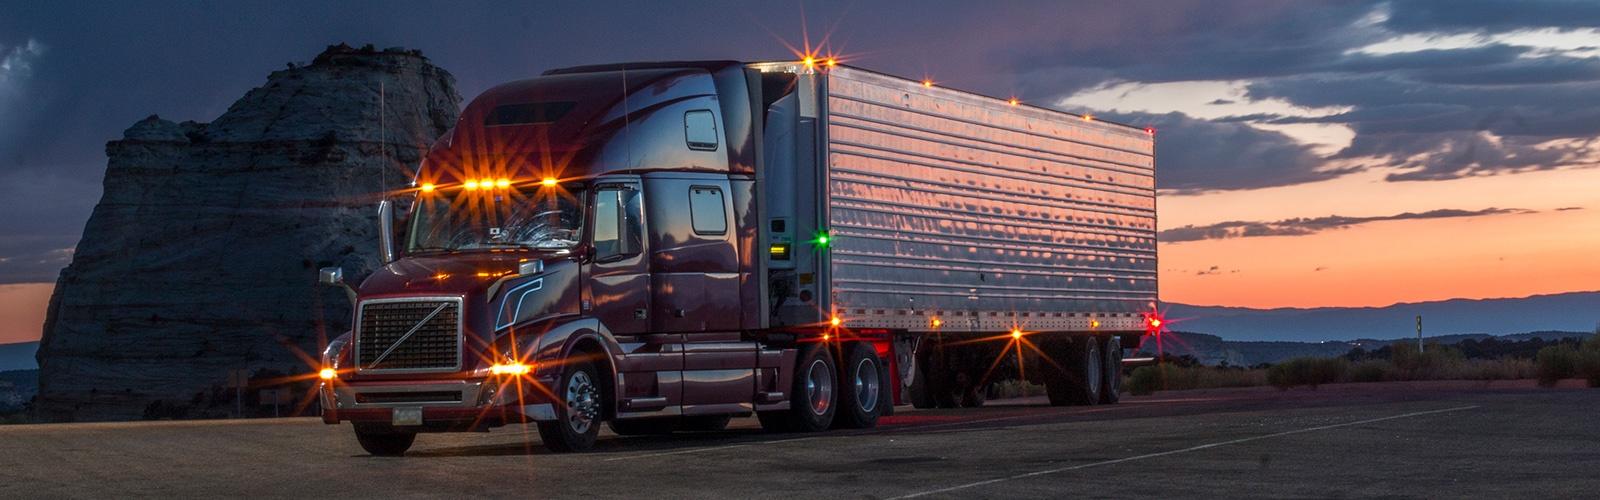 dry van freight